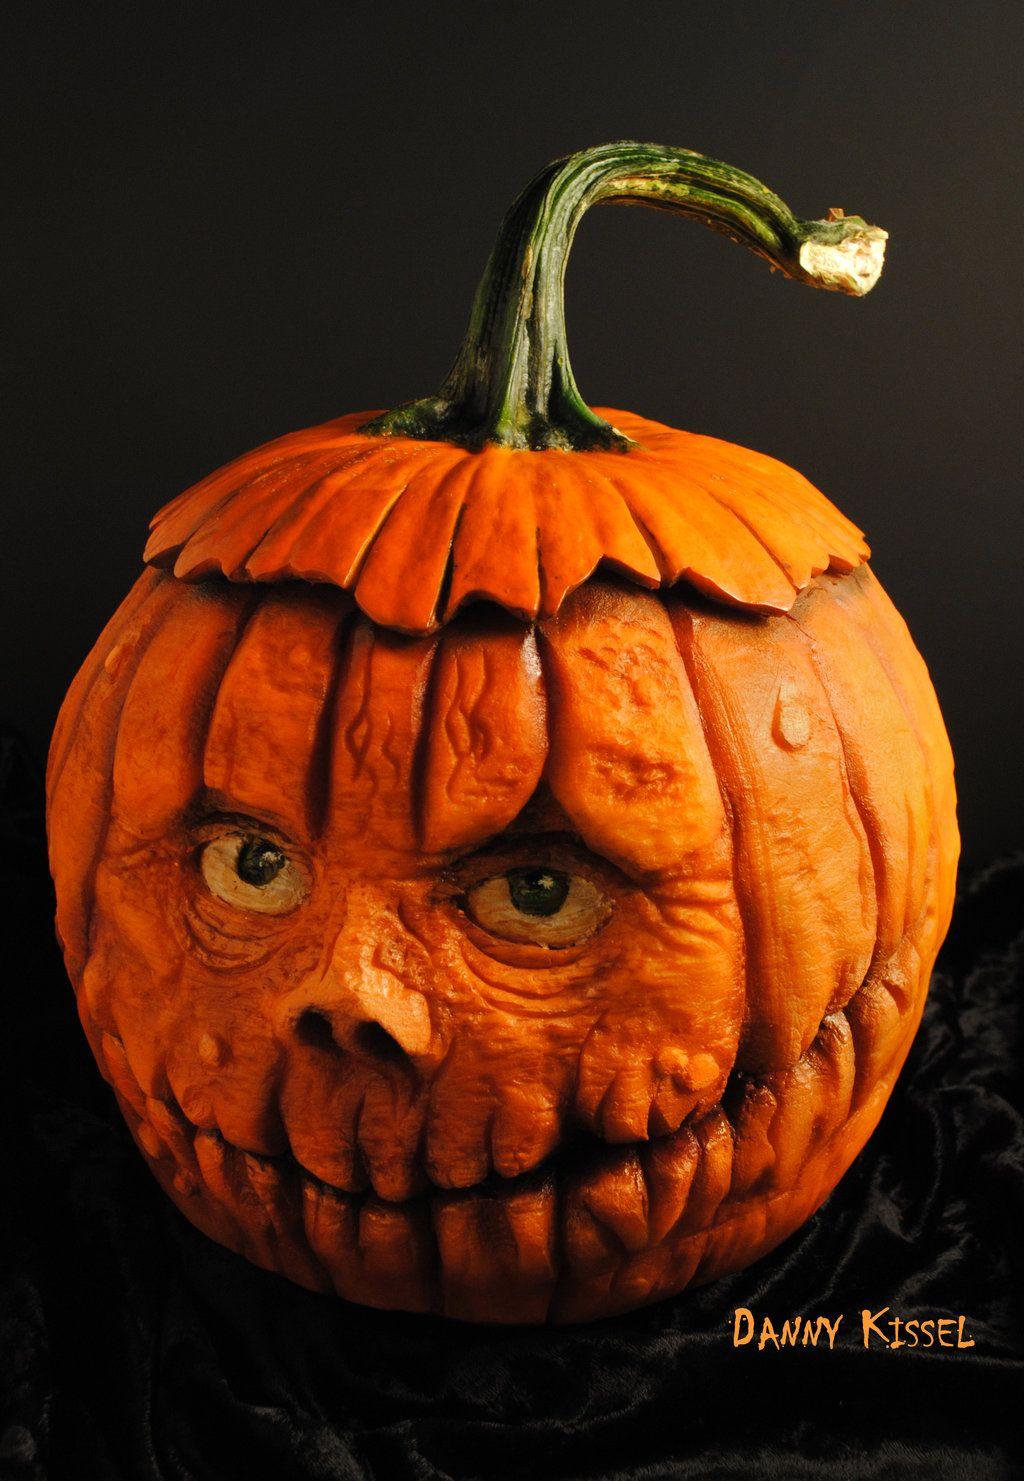 Top d pumpkin carvings in the world pinterest